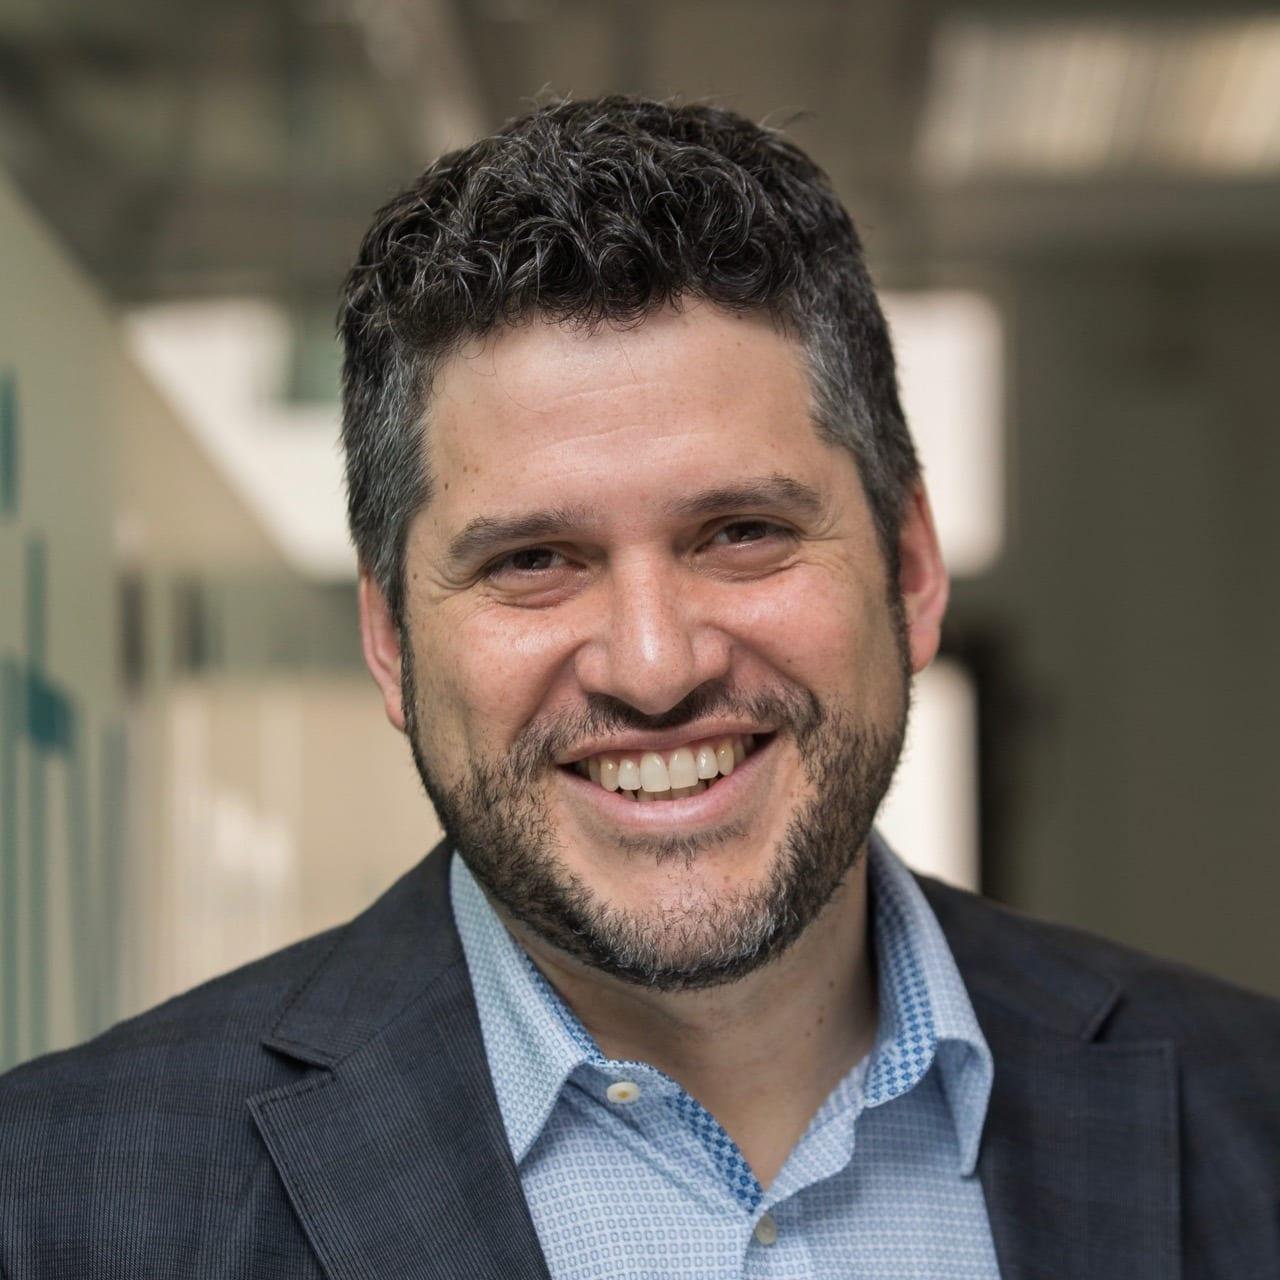 Jose Caldera, Chief Products and Marketing Officer, IdentityMind